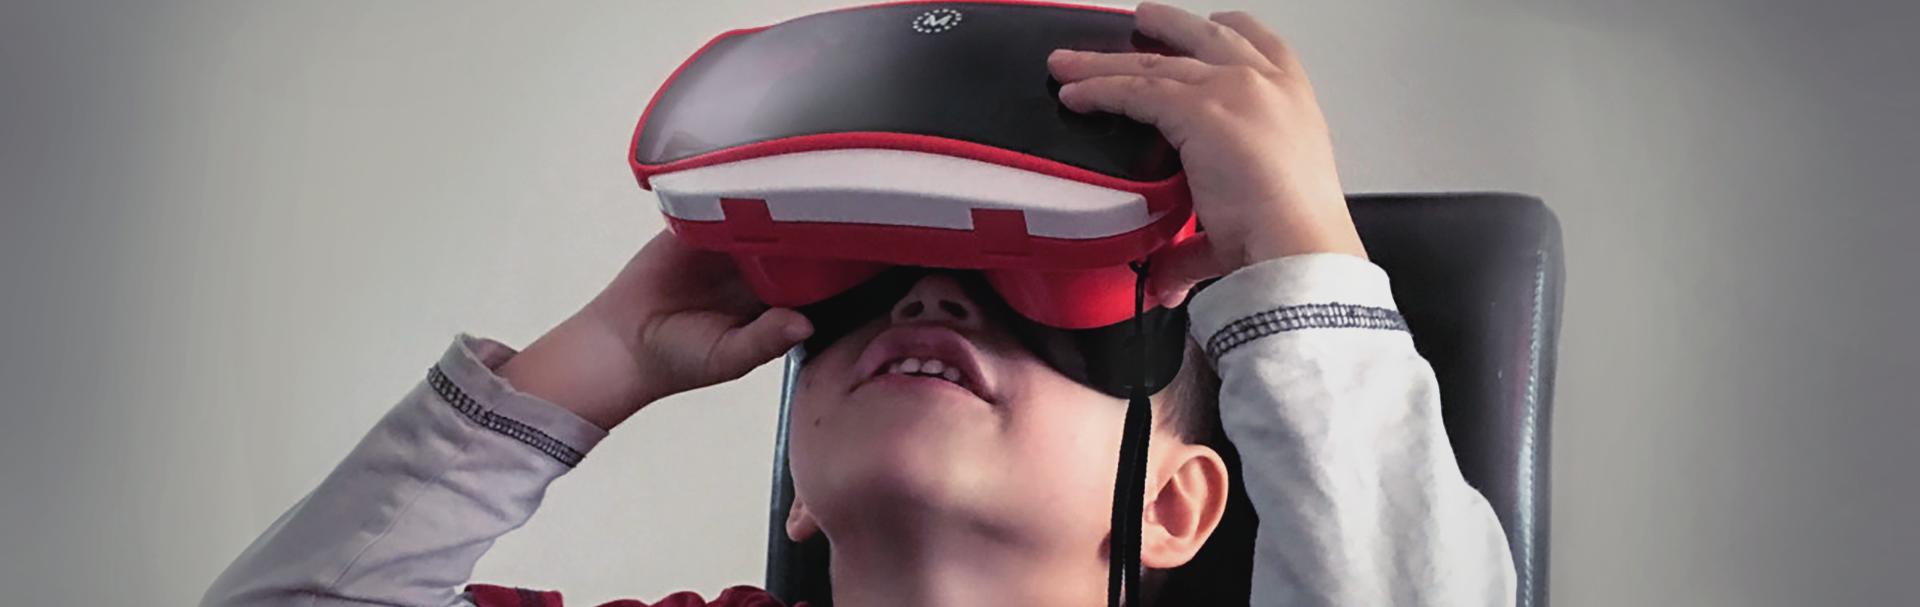 VR_EDUCATION